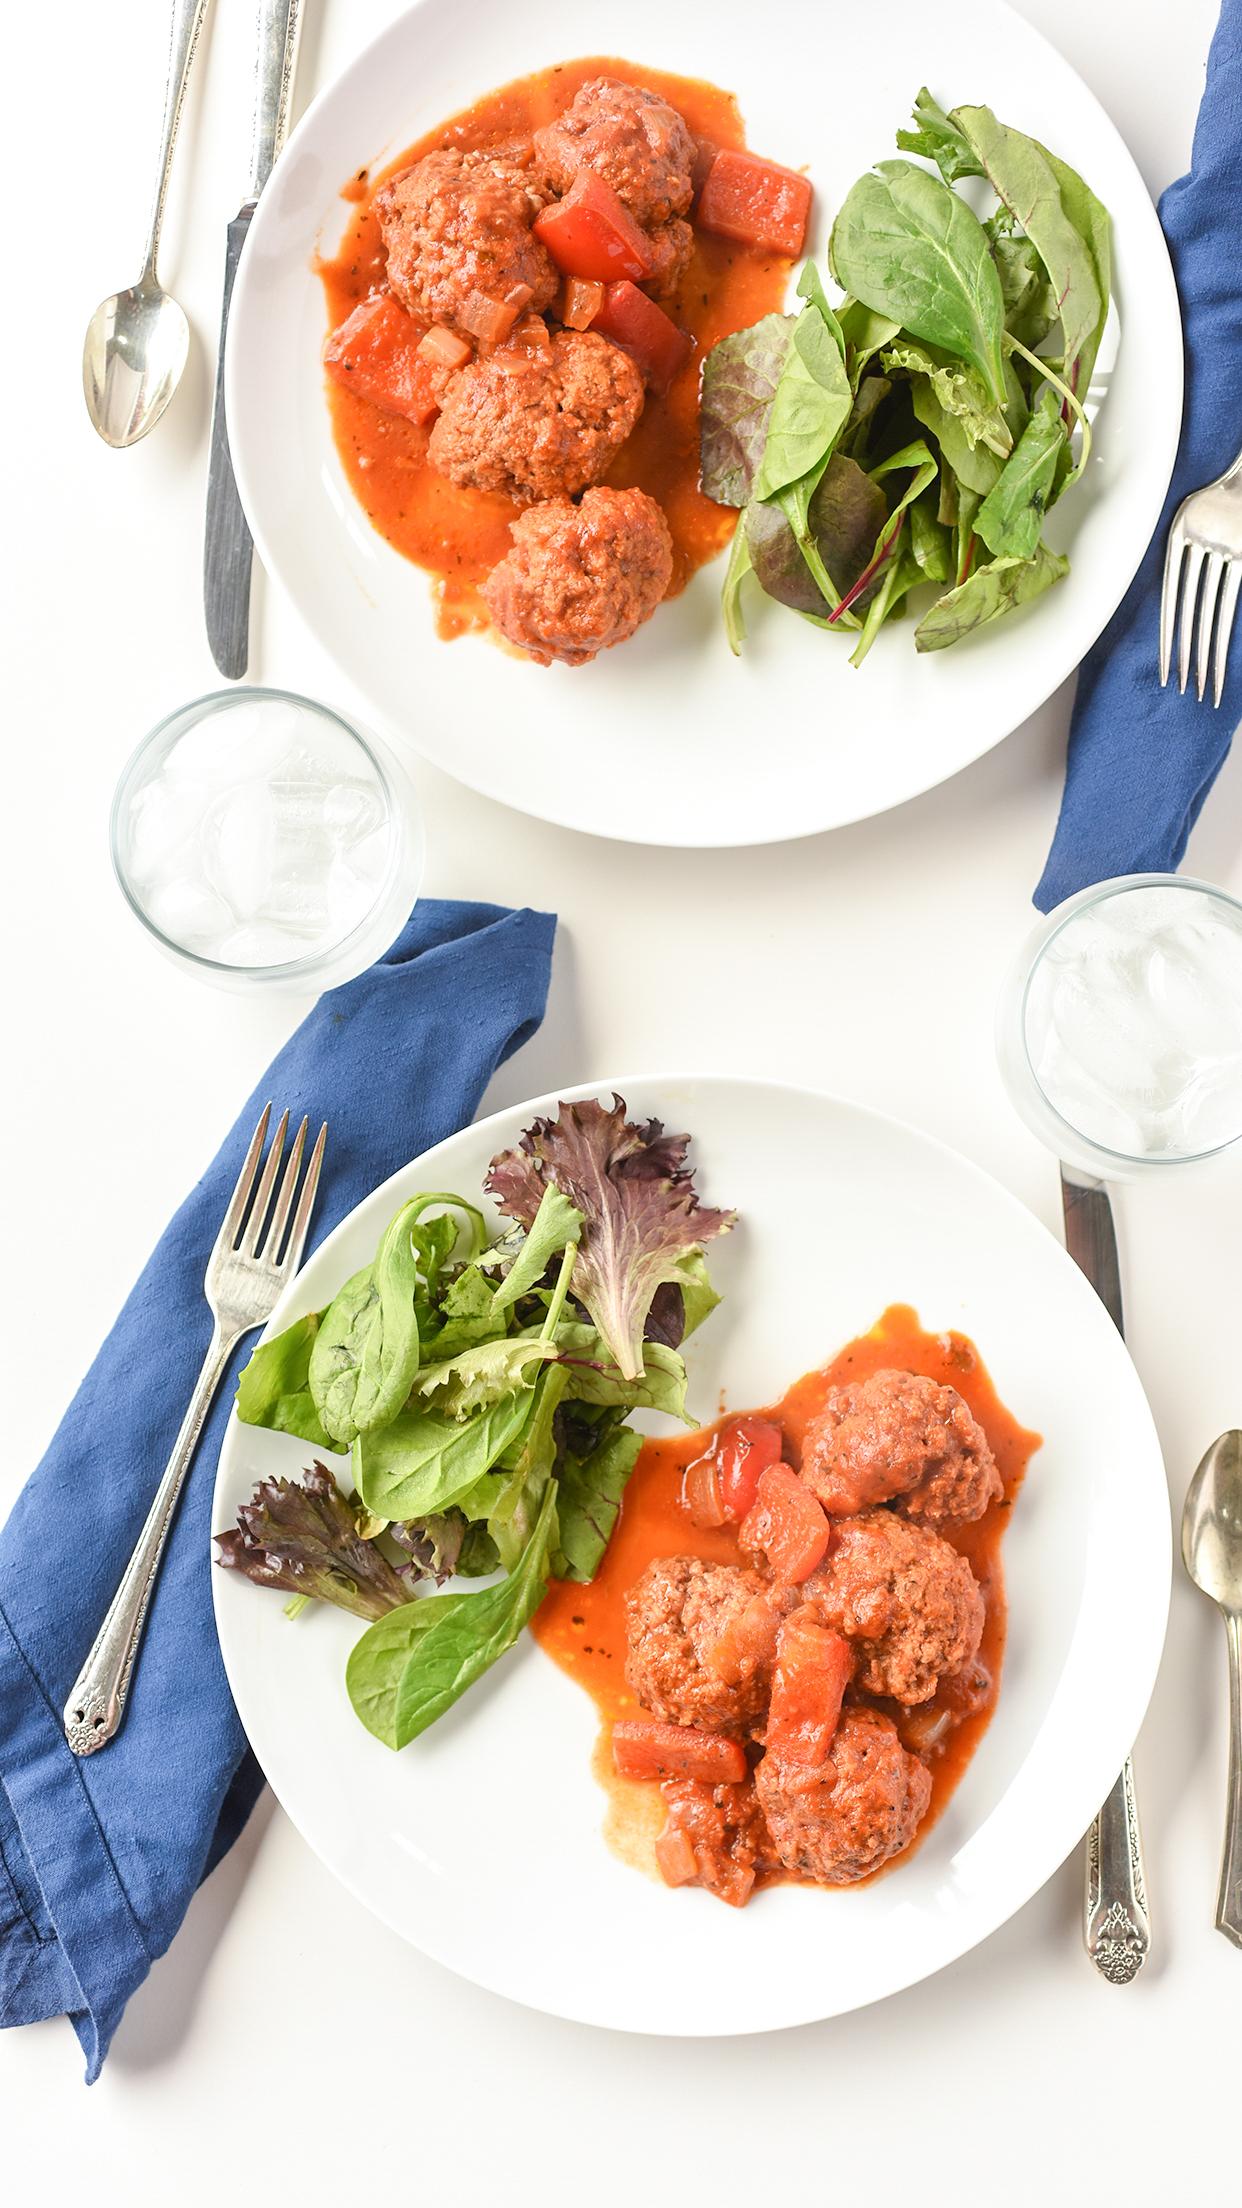 Ali Hedin | Meatballs in Red Sauce